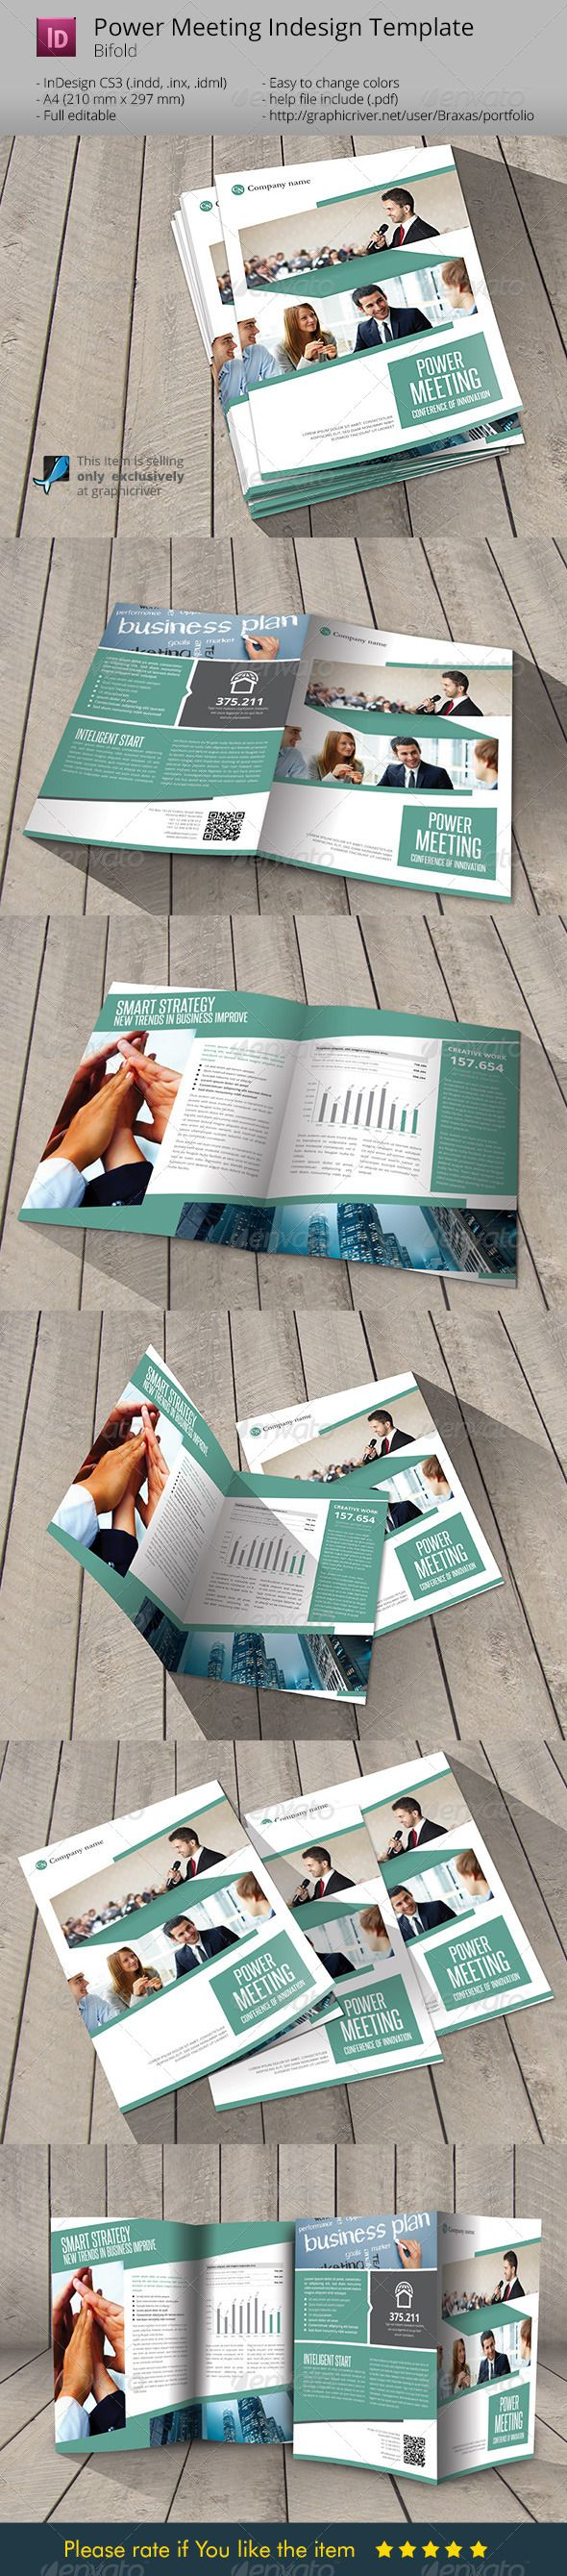 Power Meeting Indesign Template Brochure